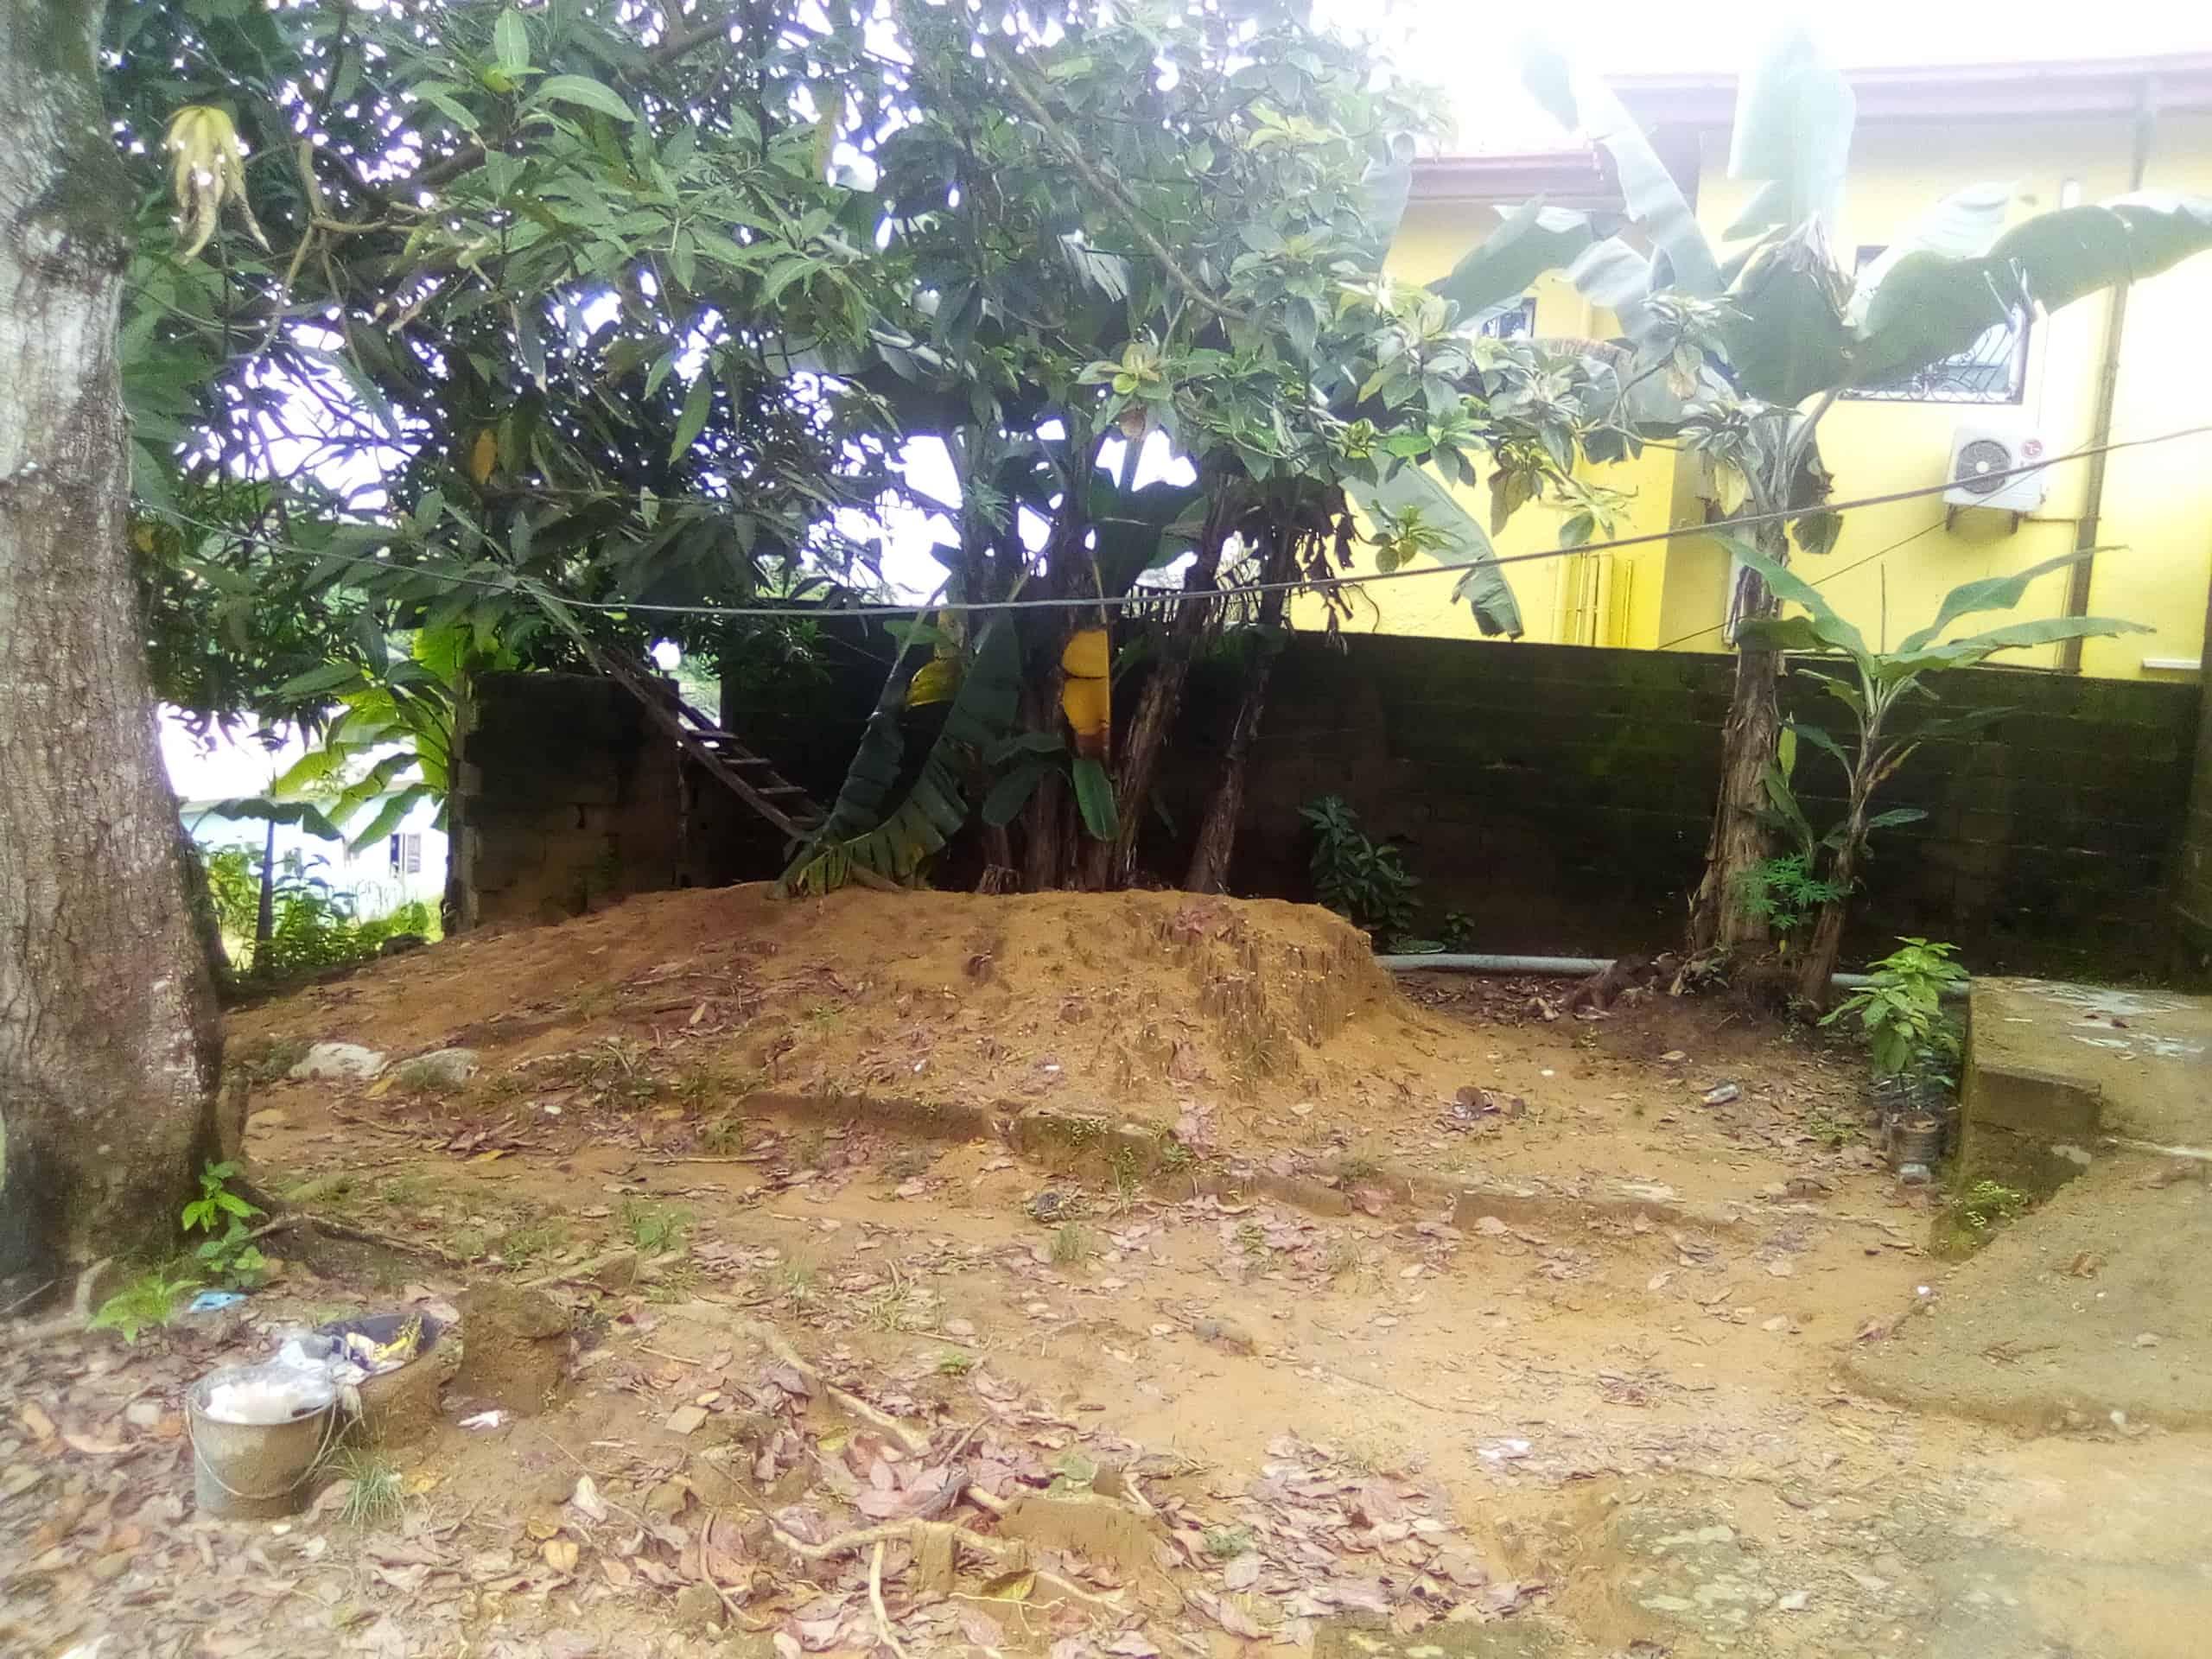 House (Villa) for sale - Douala, Logpom, Bangos - 1 living room(s), 3 bedroom(s), 2 bathroom(s) - 13 000 000 FCFA / month